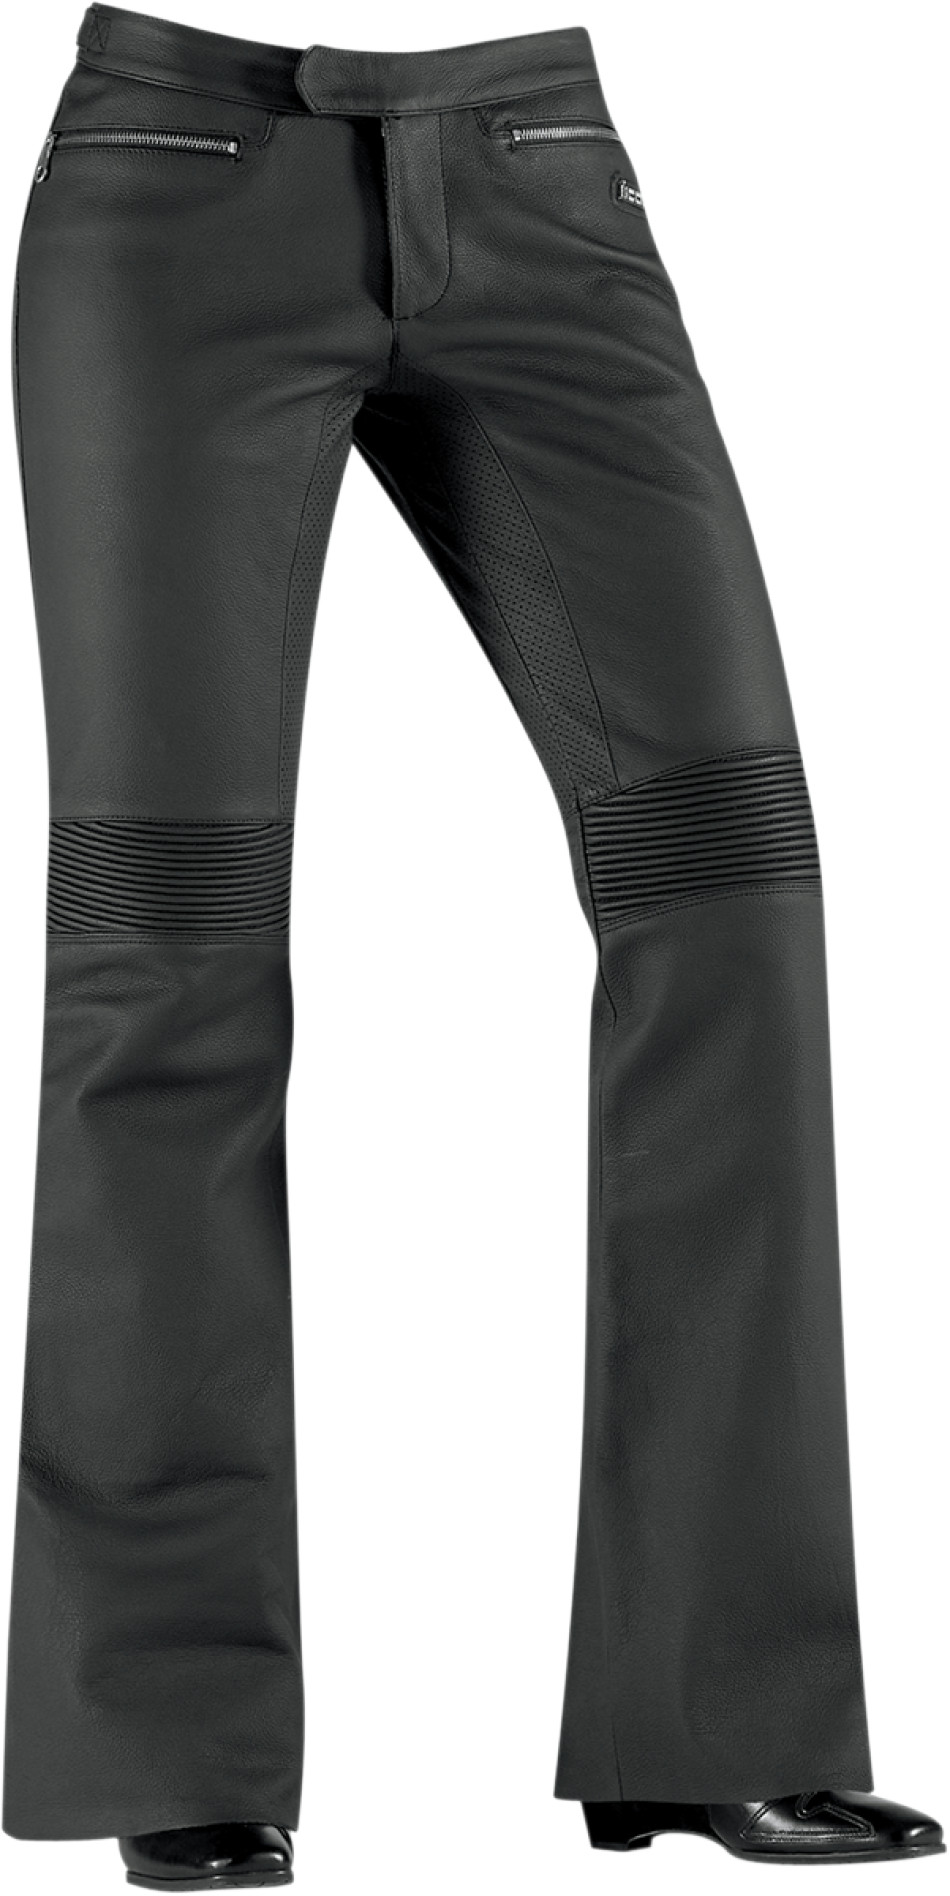 【ICON】褲子 PANT WM HELLA BLACK - 「Webike-摩托百貨」